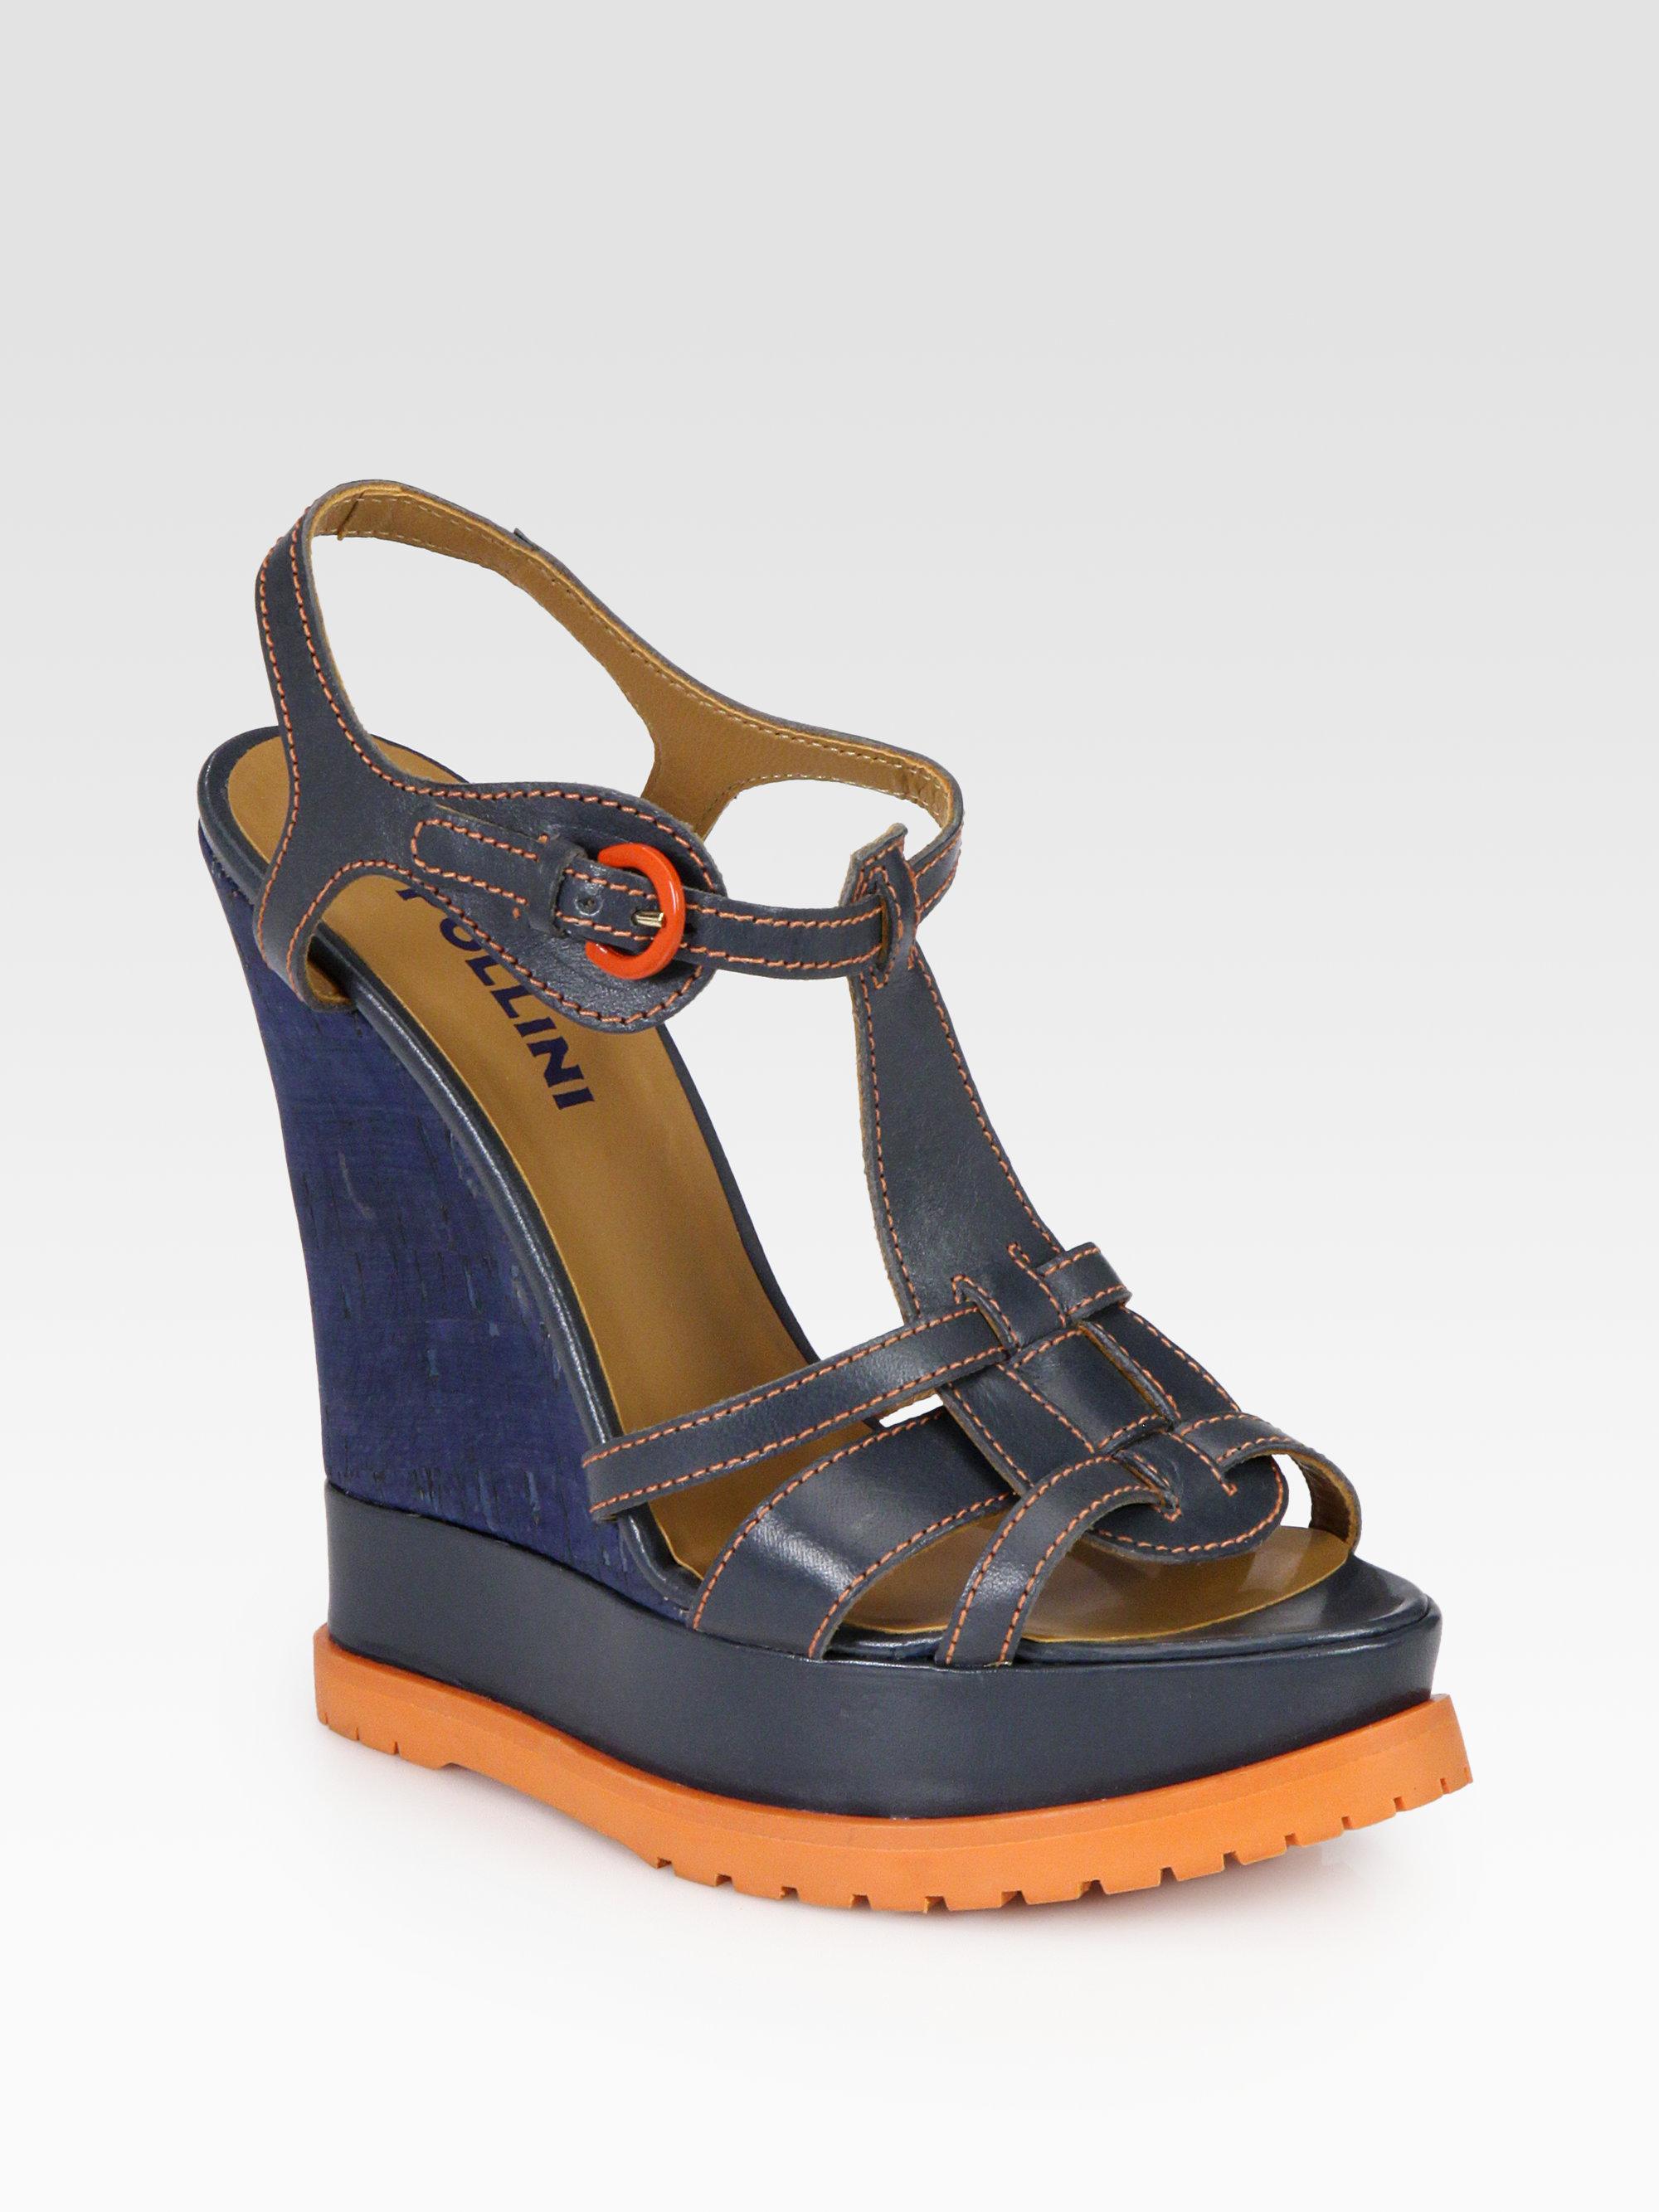 pollini leather cork wedge sandals in blue blue orange